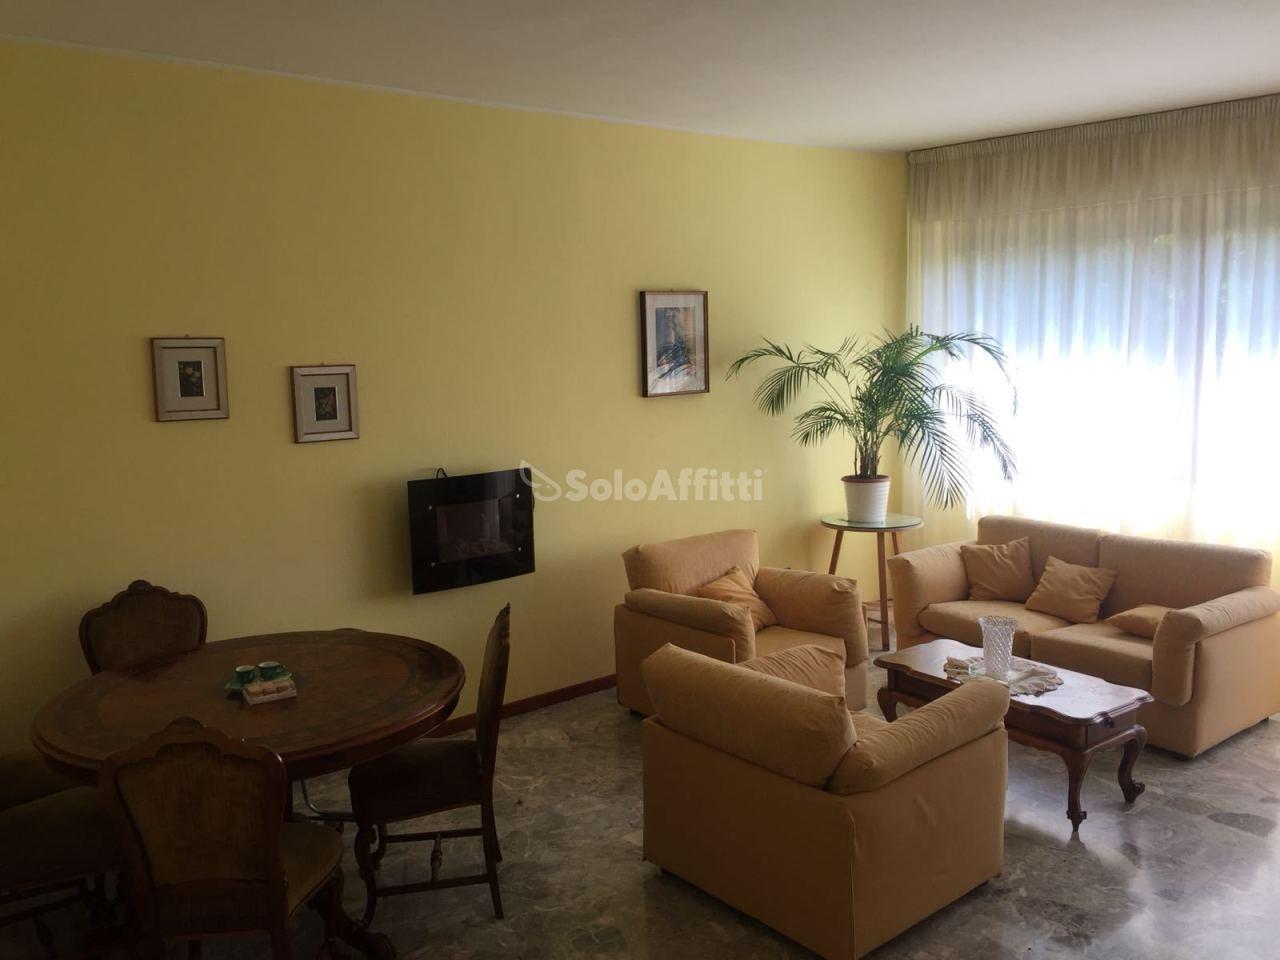 Appartamento - Quadrilocale a Viale Regina Elena, Pescara